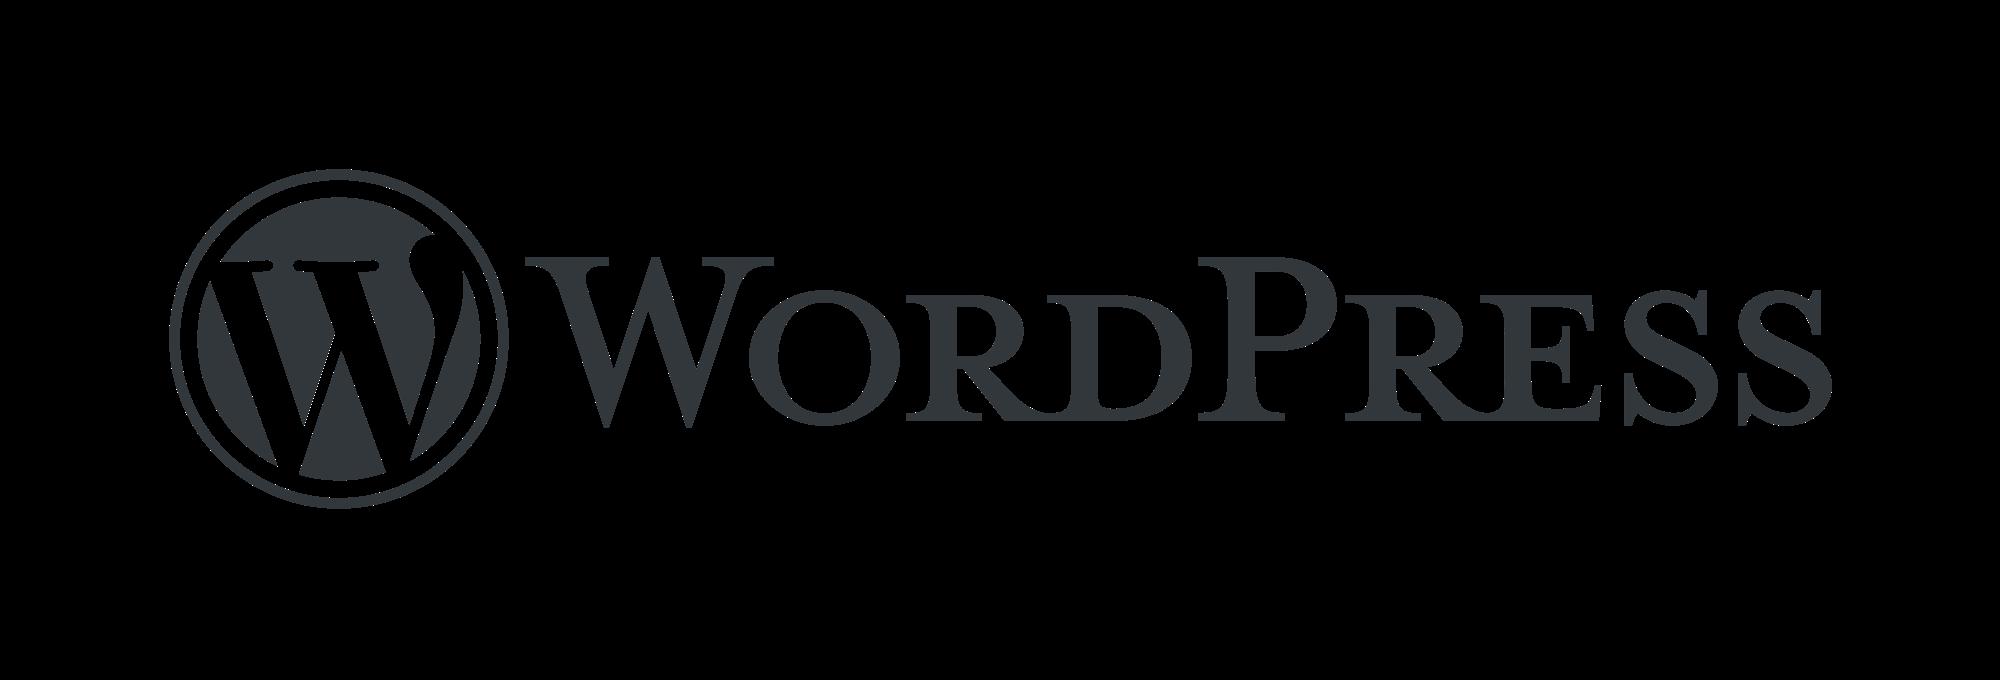 WordPress-logotype-tancomedia